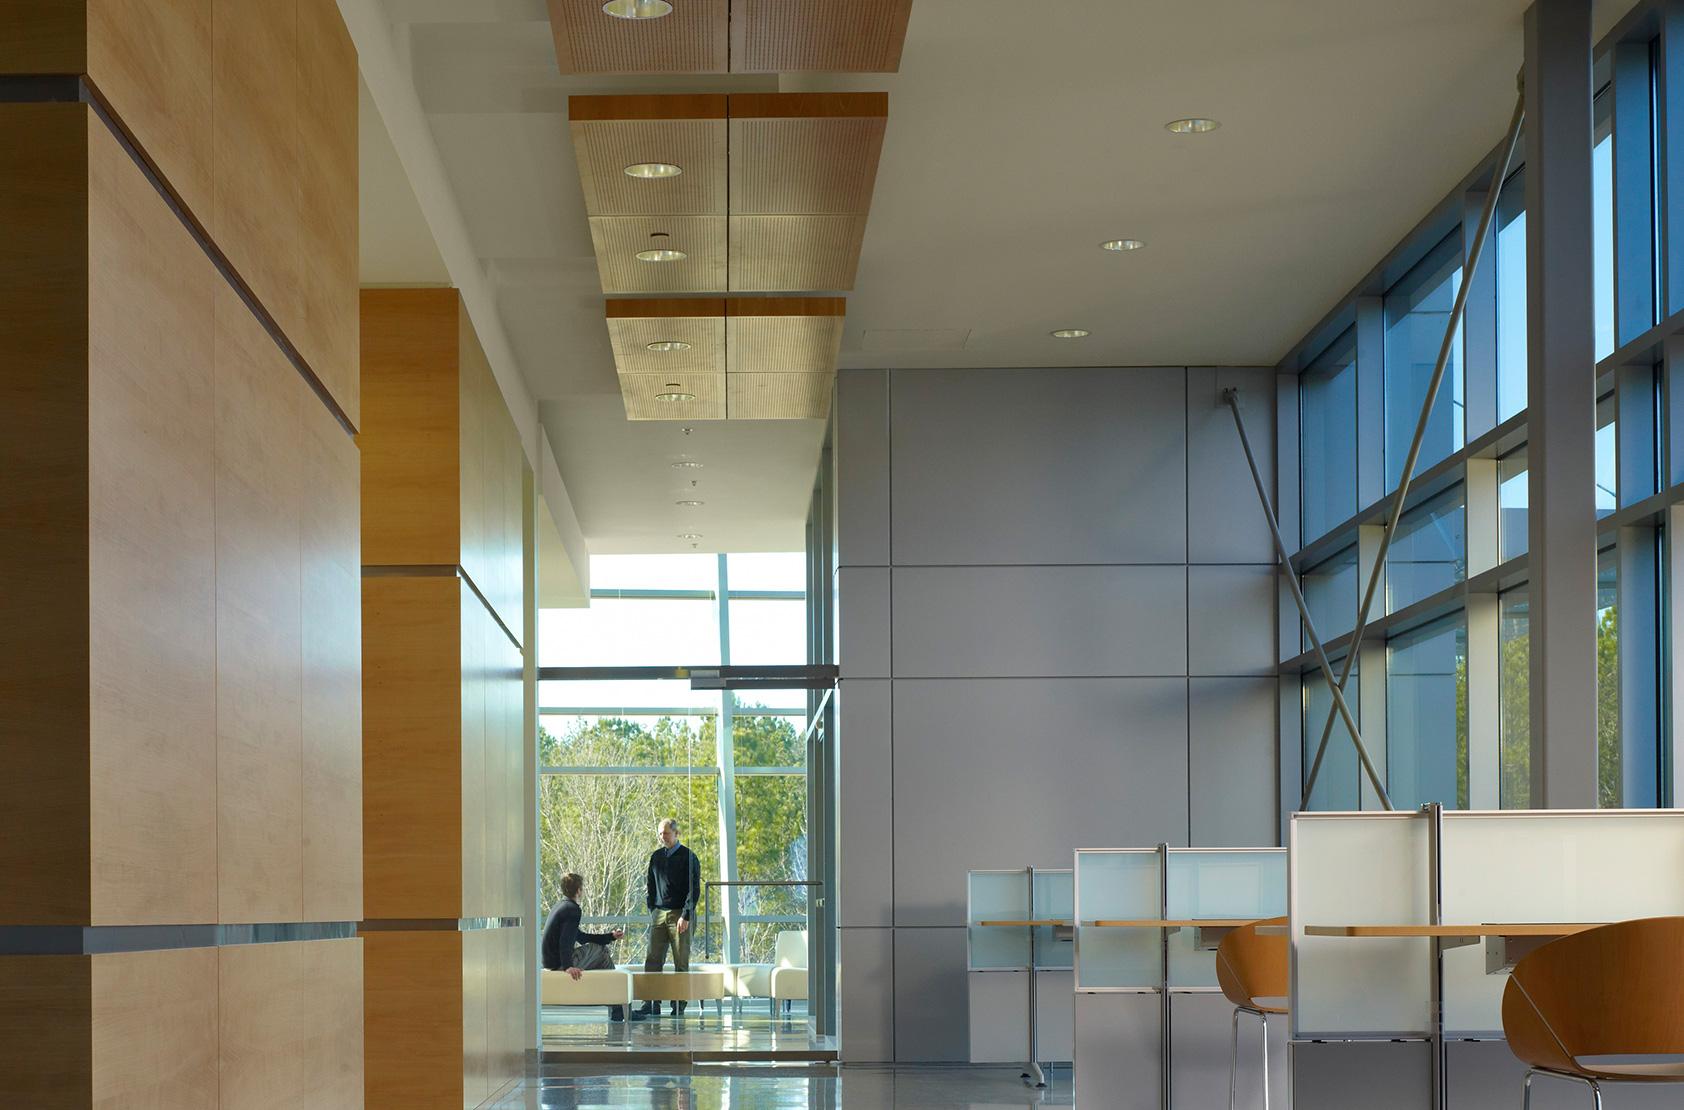 Novartis - USFCC QA/QC Testing & Administration Facility